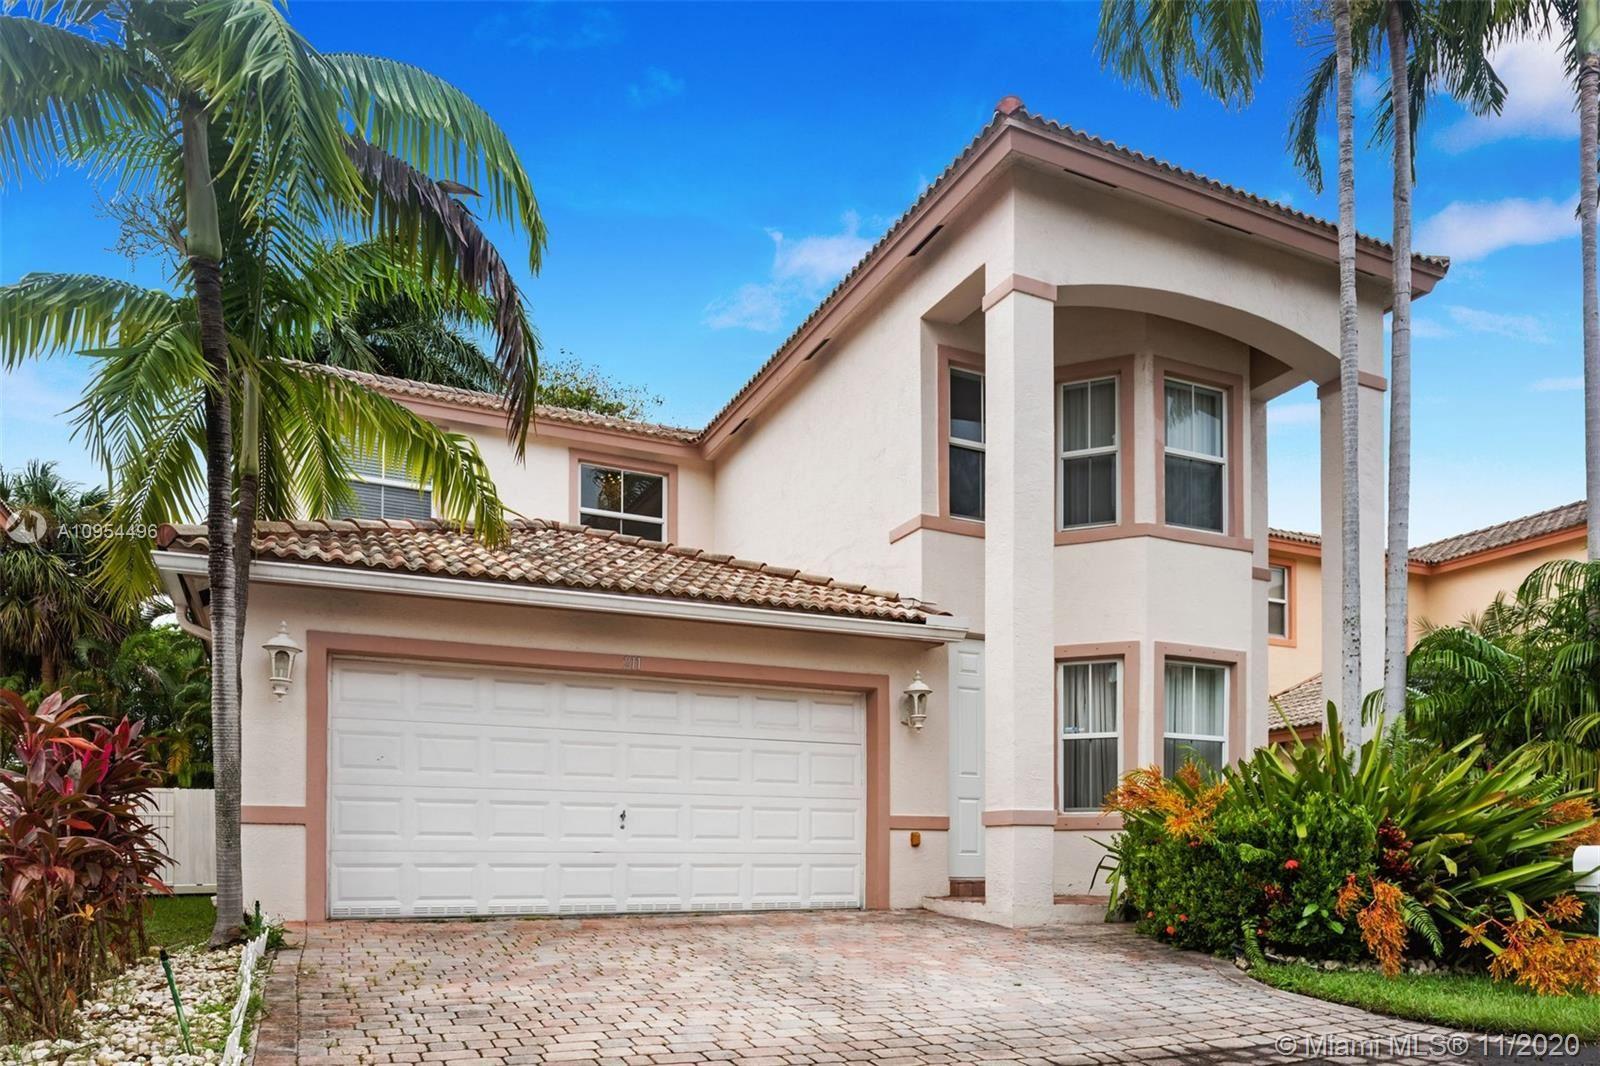 Photo of 211 SE 15th St, Dania Beach, FL 33004 (MLS # A10954496)